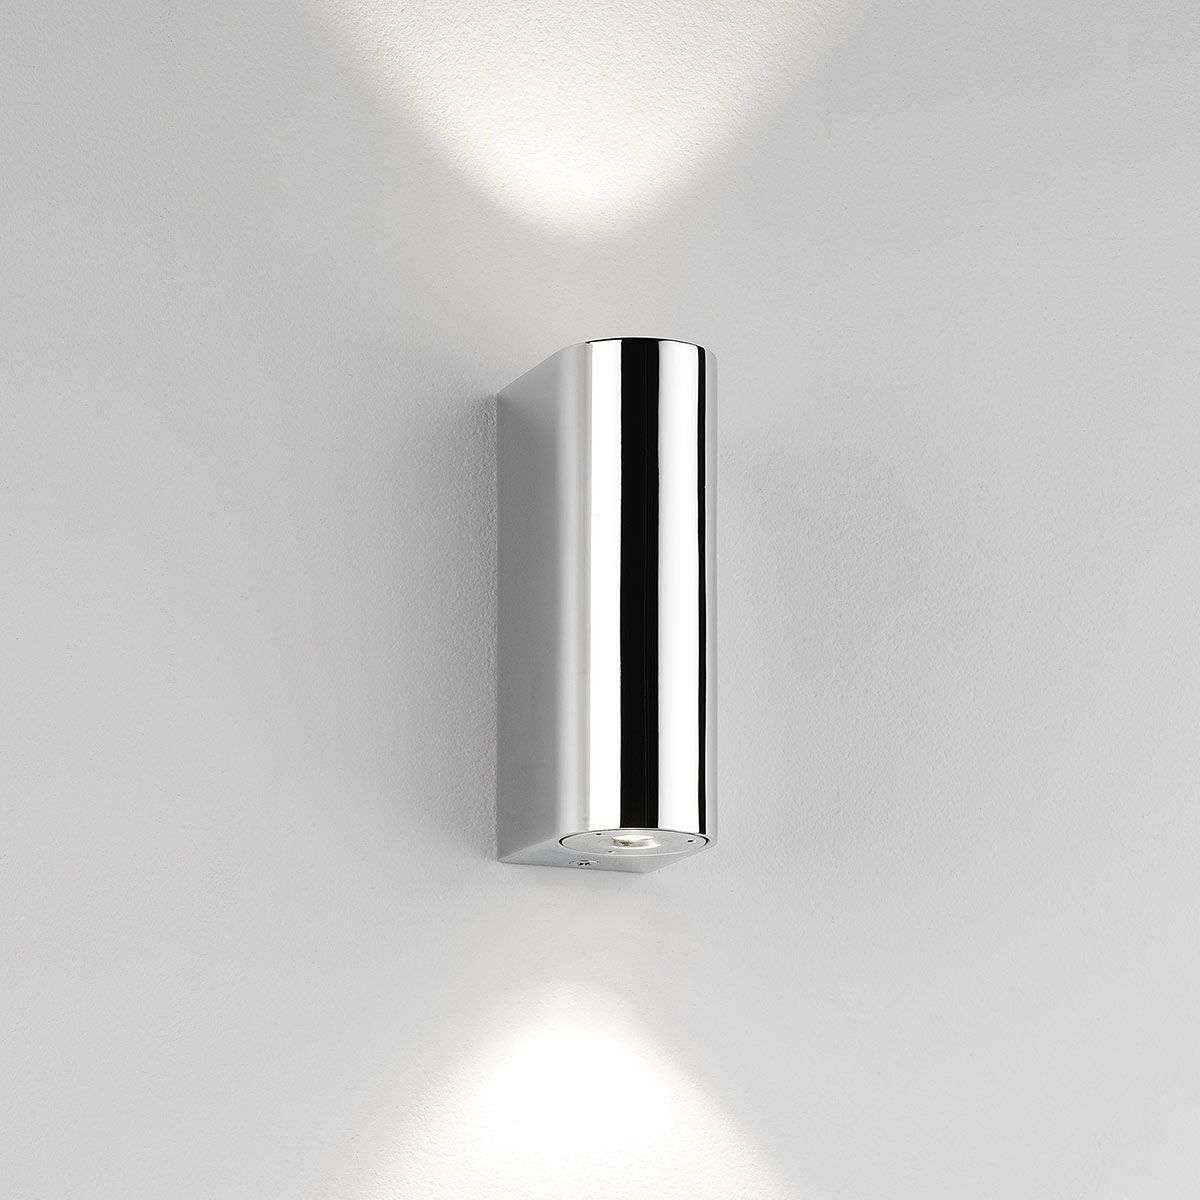 Alba LED Wall Light Modern-1020296-32